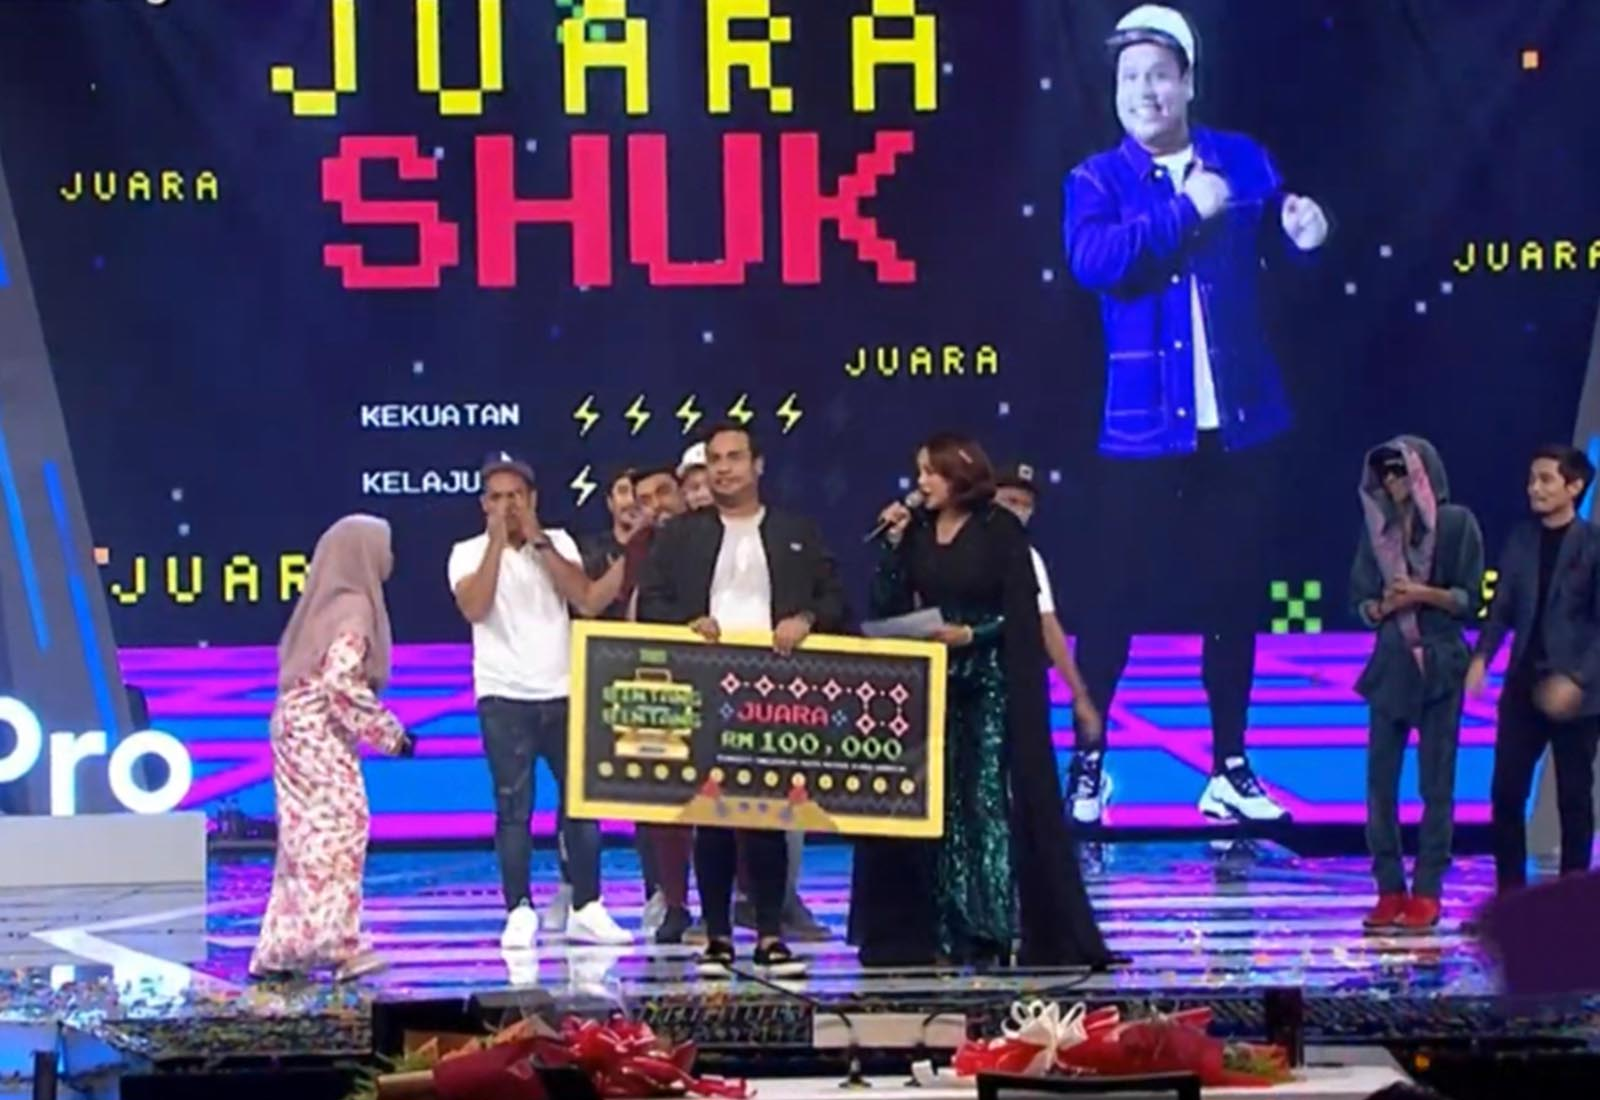 Photo of Shuk Muncul Juara BBB 2019, Bawa Pulang Wang Tunai RM100,000